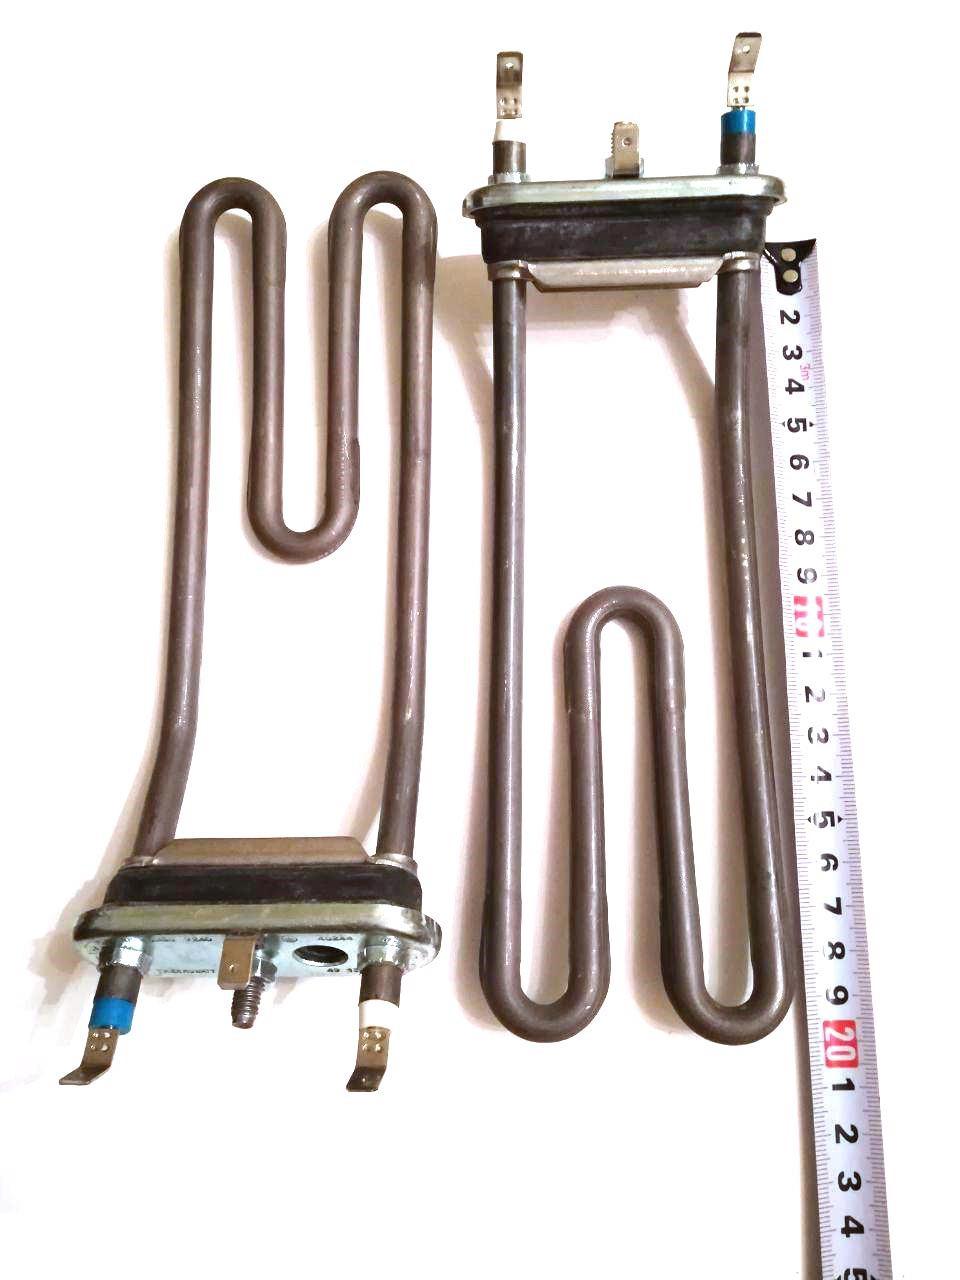 Тэн на стиральную машину 1950W гнутый / L=200мм под датчик / Thermowatt (Италия)